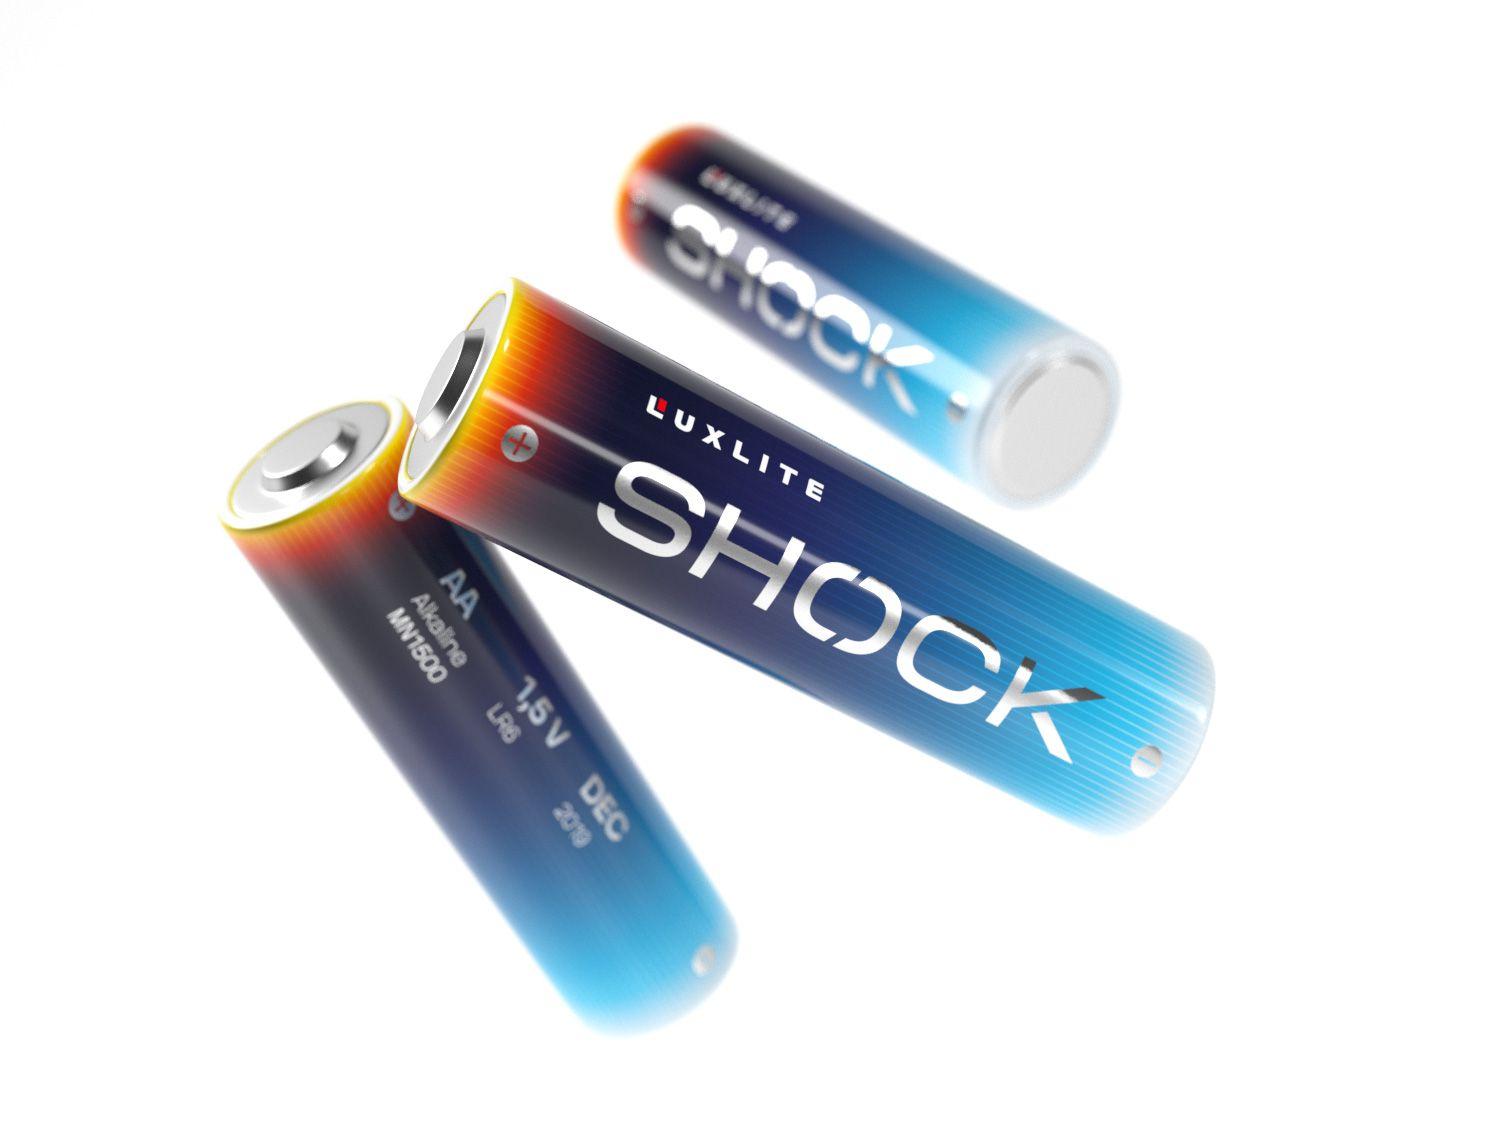 Логотип для батареек LUXLITE SHOCK - дизайнер DmitryMikhailov